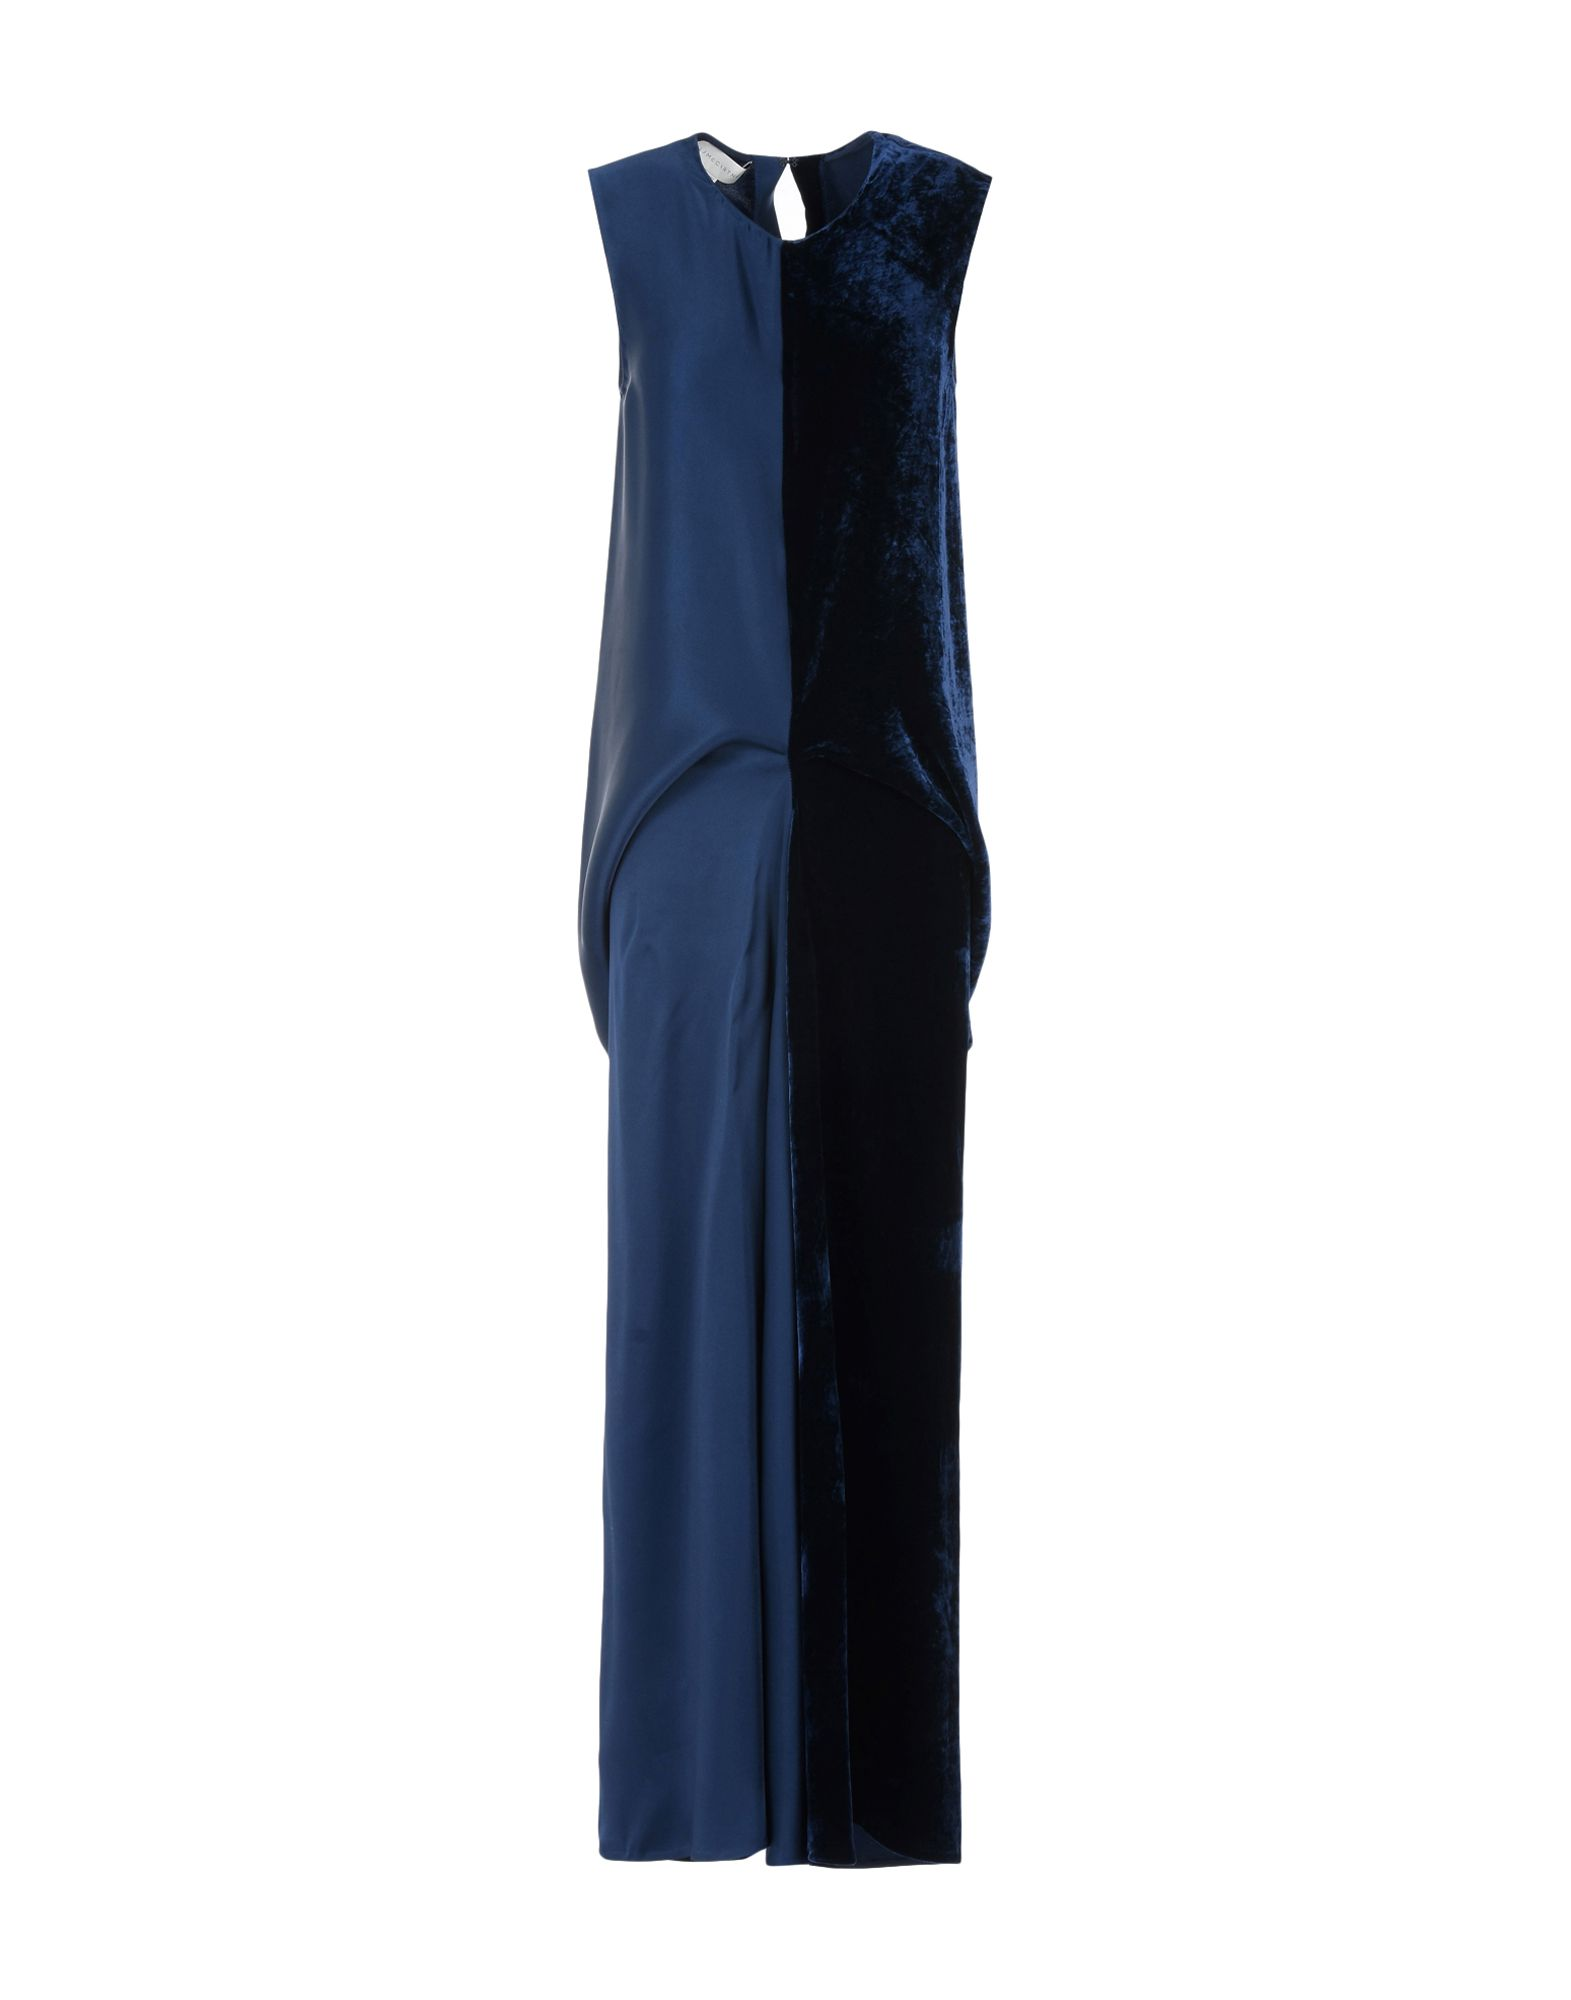 Vestito Lungo Stella Mccartney Mccartney Mccartney donna - 34761350IQ b89